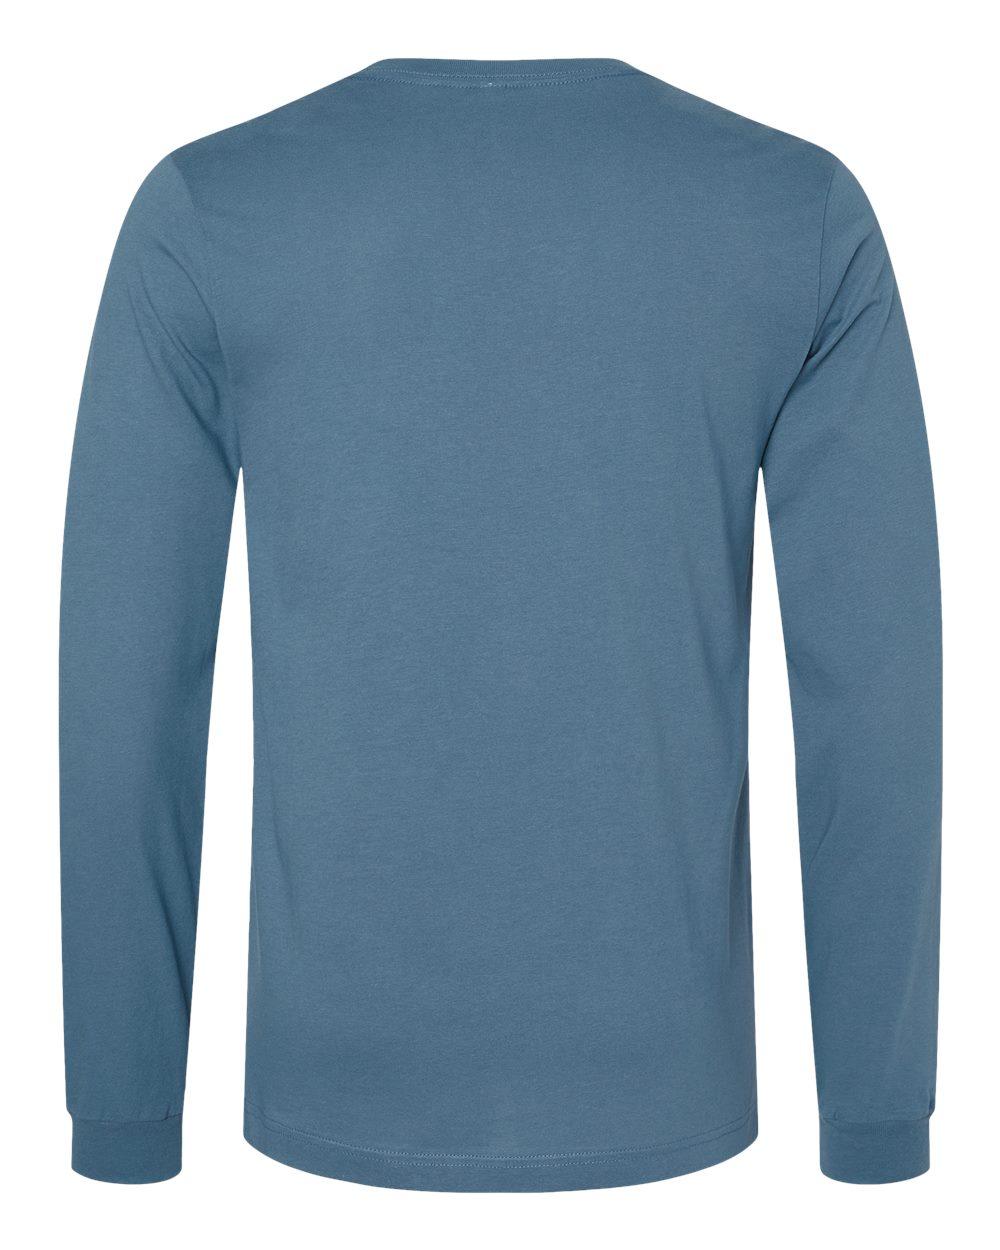 Bella-Canvas-Mens-Blank-Top-Long-Sleeve-Jersey-Tee-T-Shirt-3501-up-to-3XL thumbnail 56